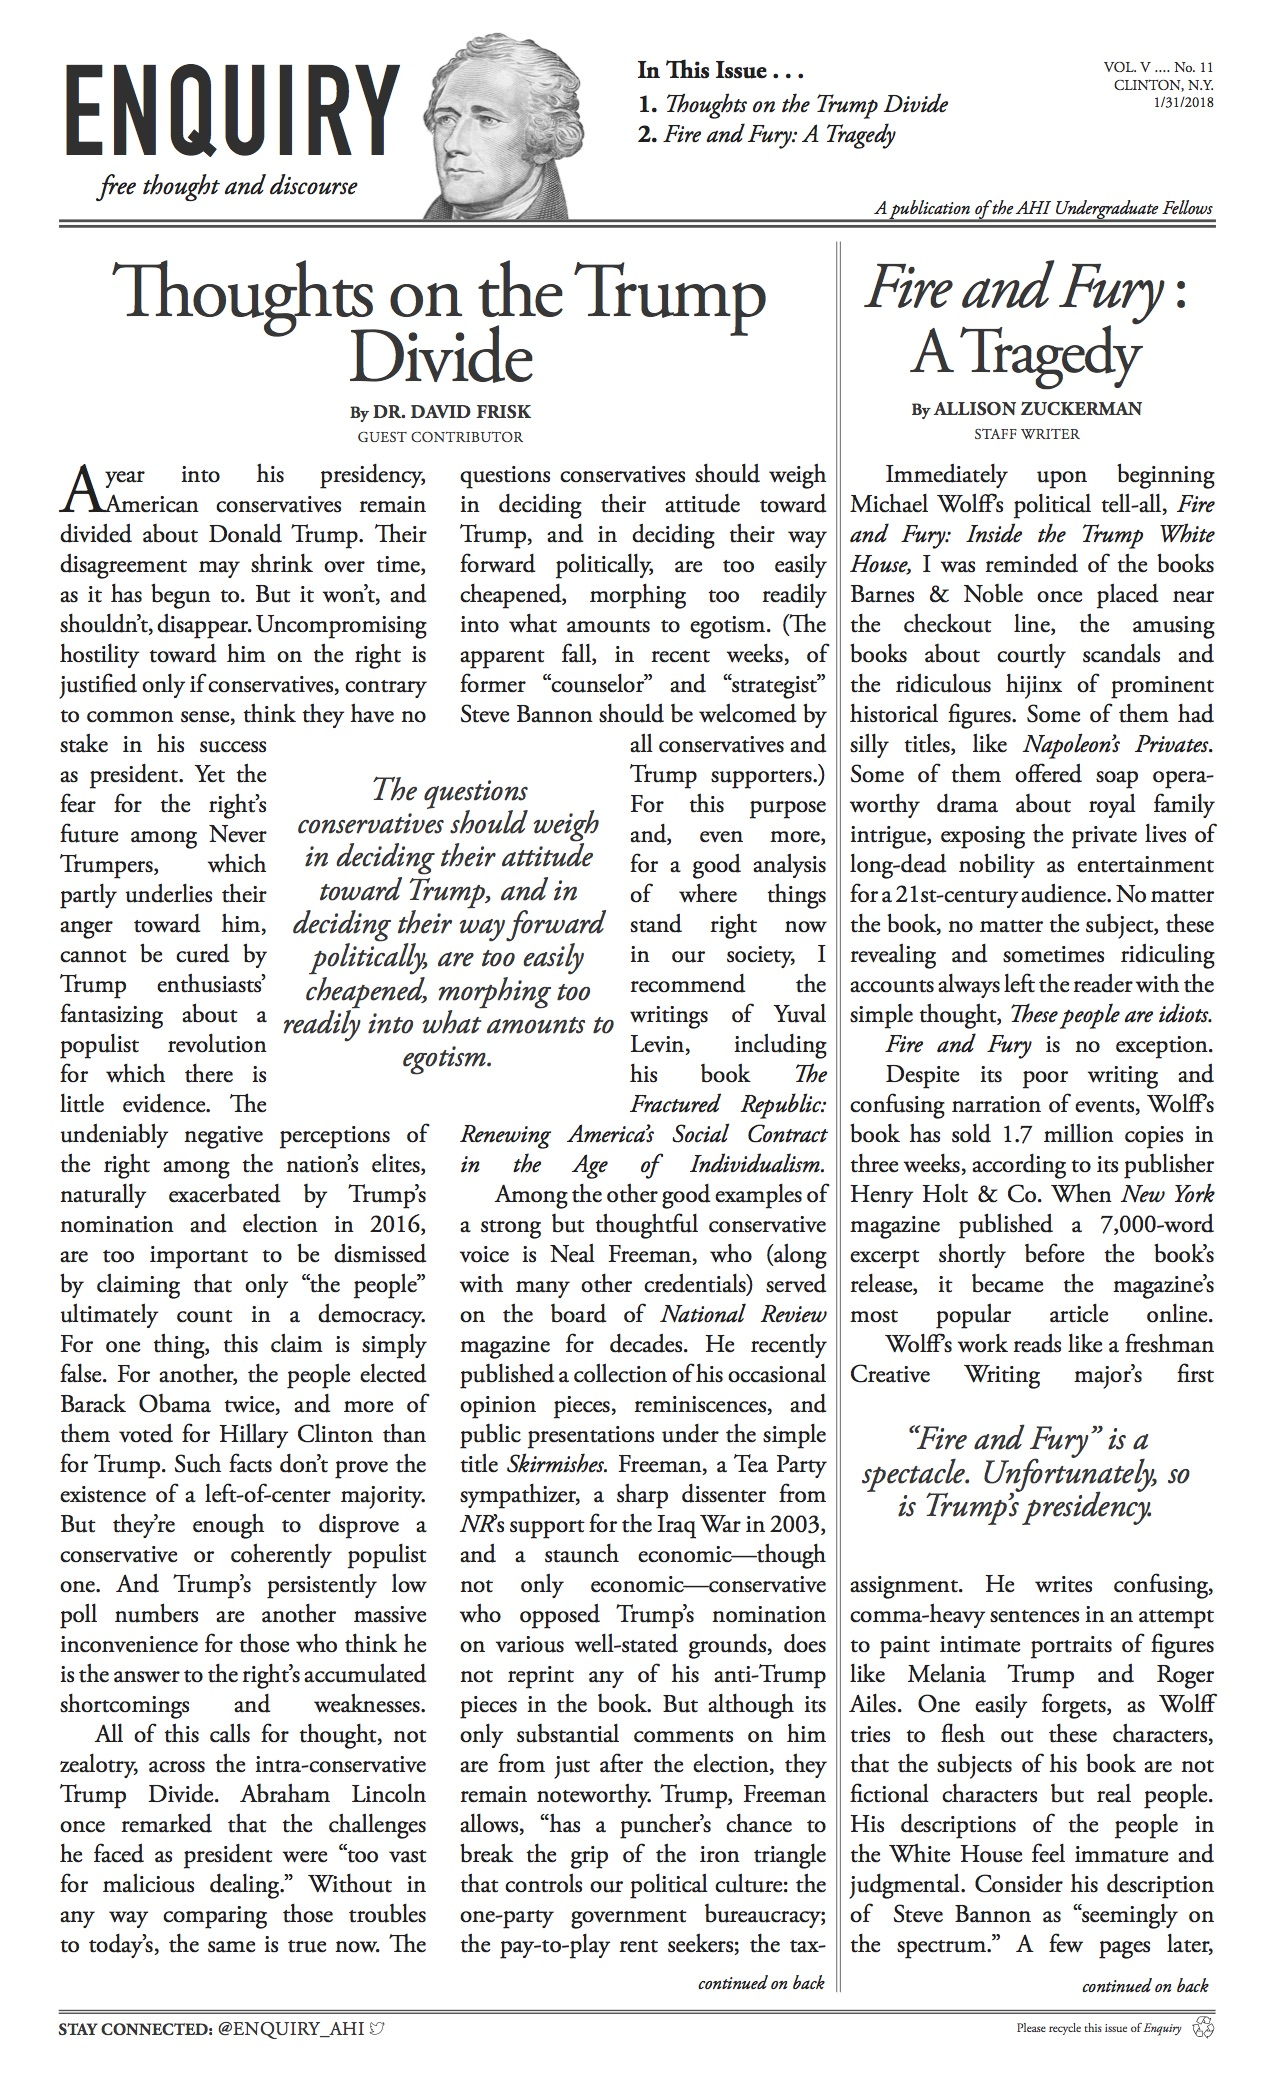 Enquiry Vol 5 No 11 front.jpg